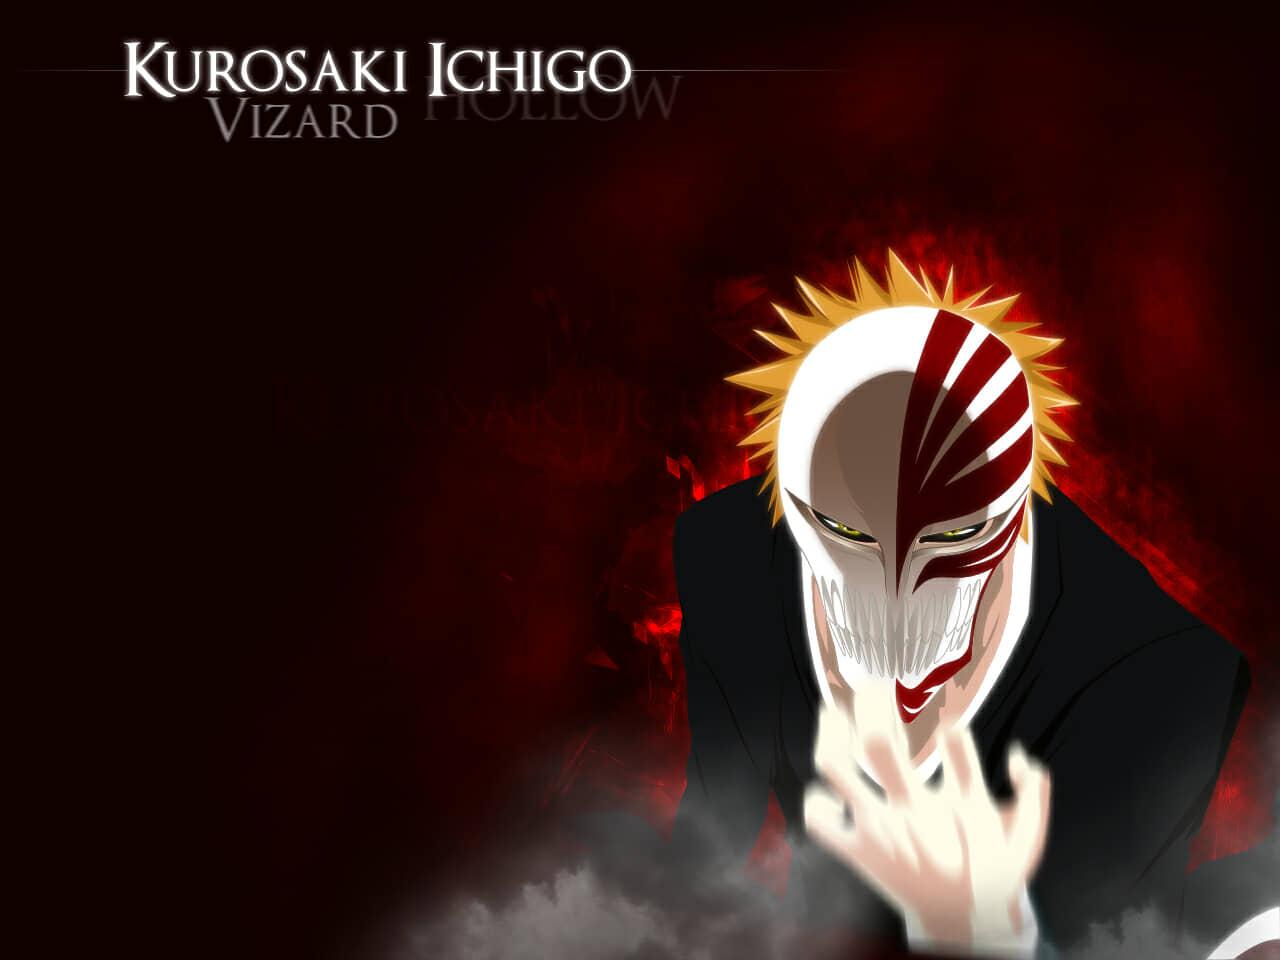 Bleach Ichigo Kurosaki Full Cosplay Hollow Mask For Sale